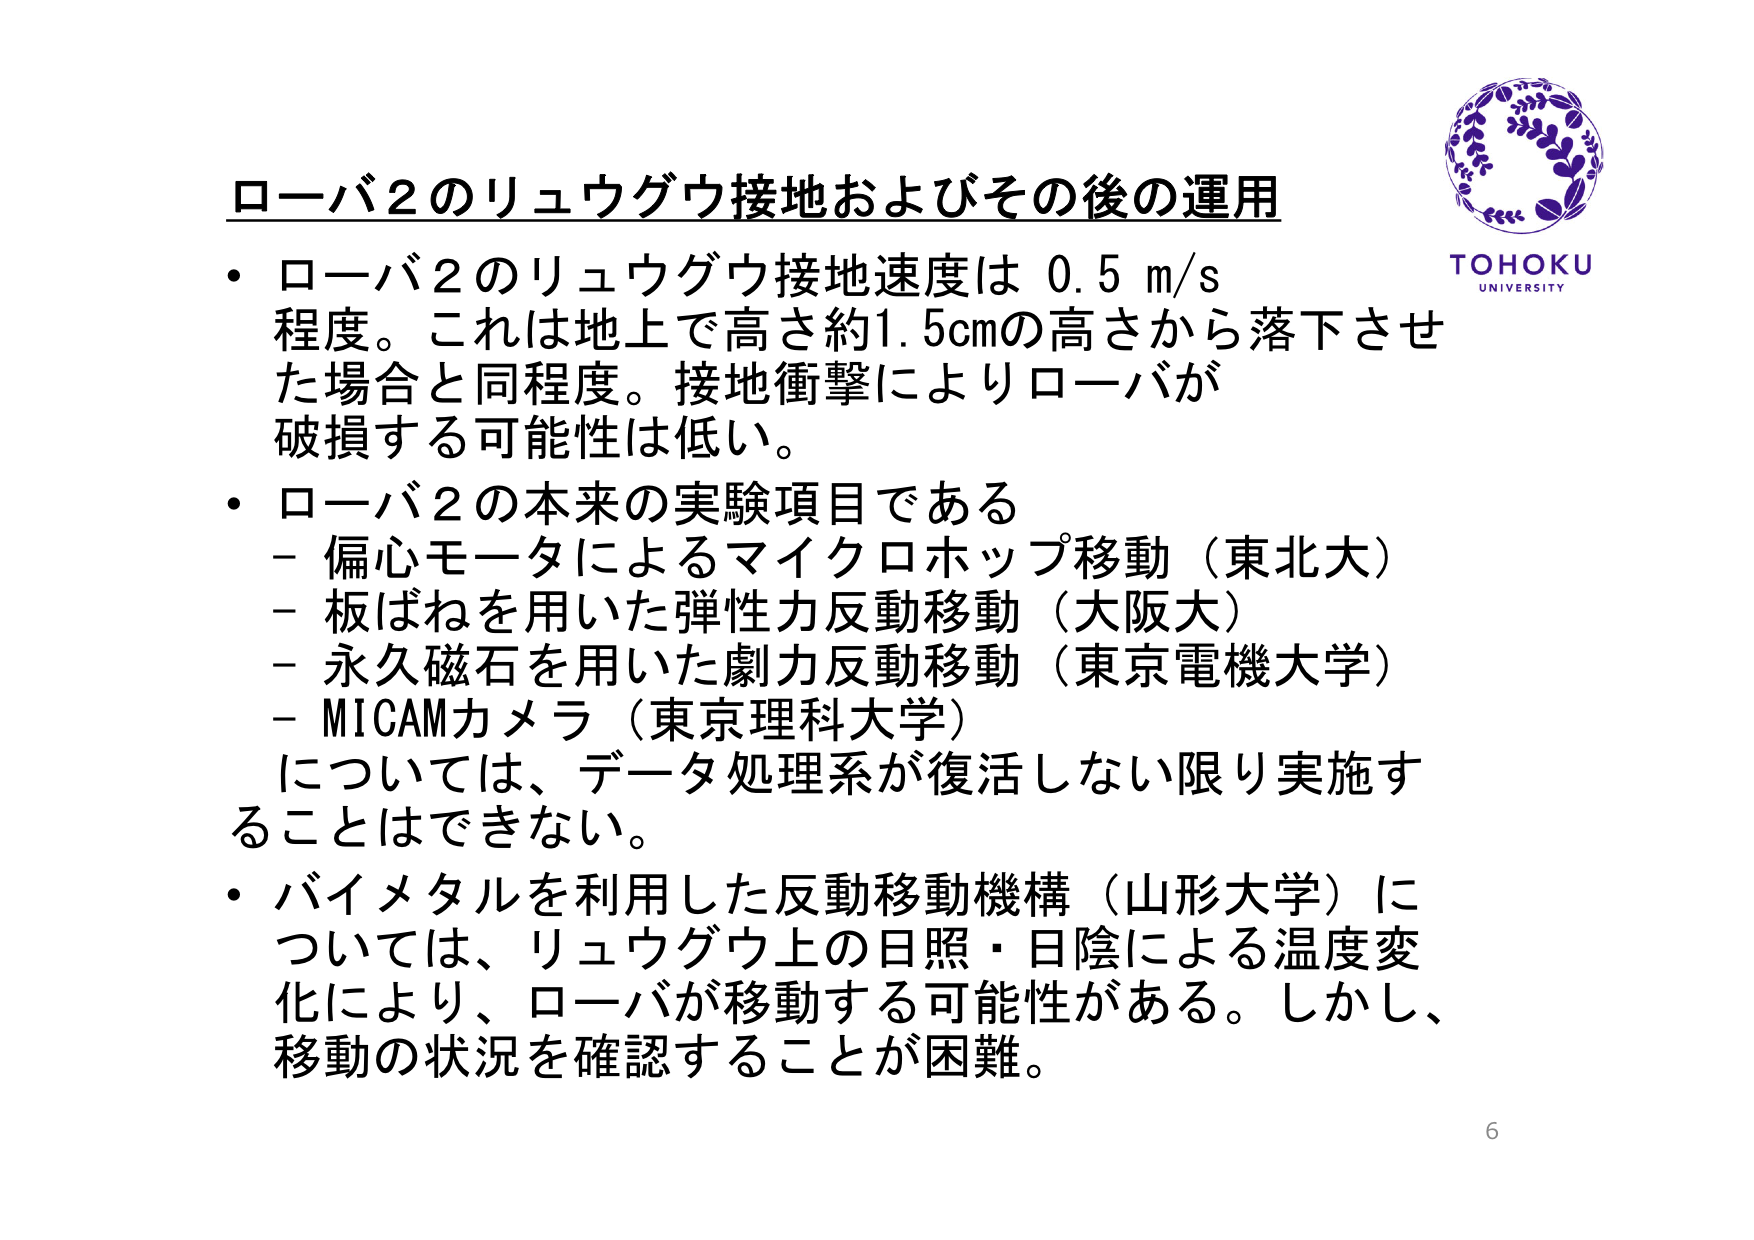 f:id:Imamura:20190924122710p:plain